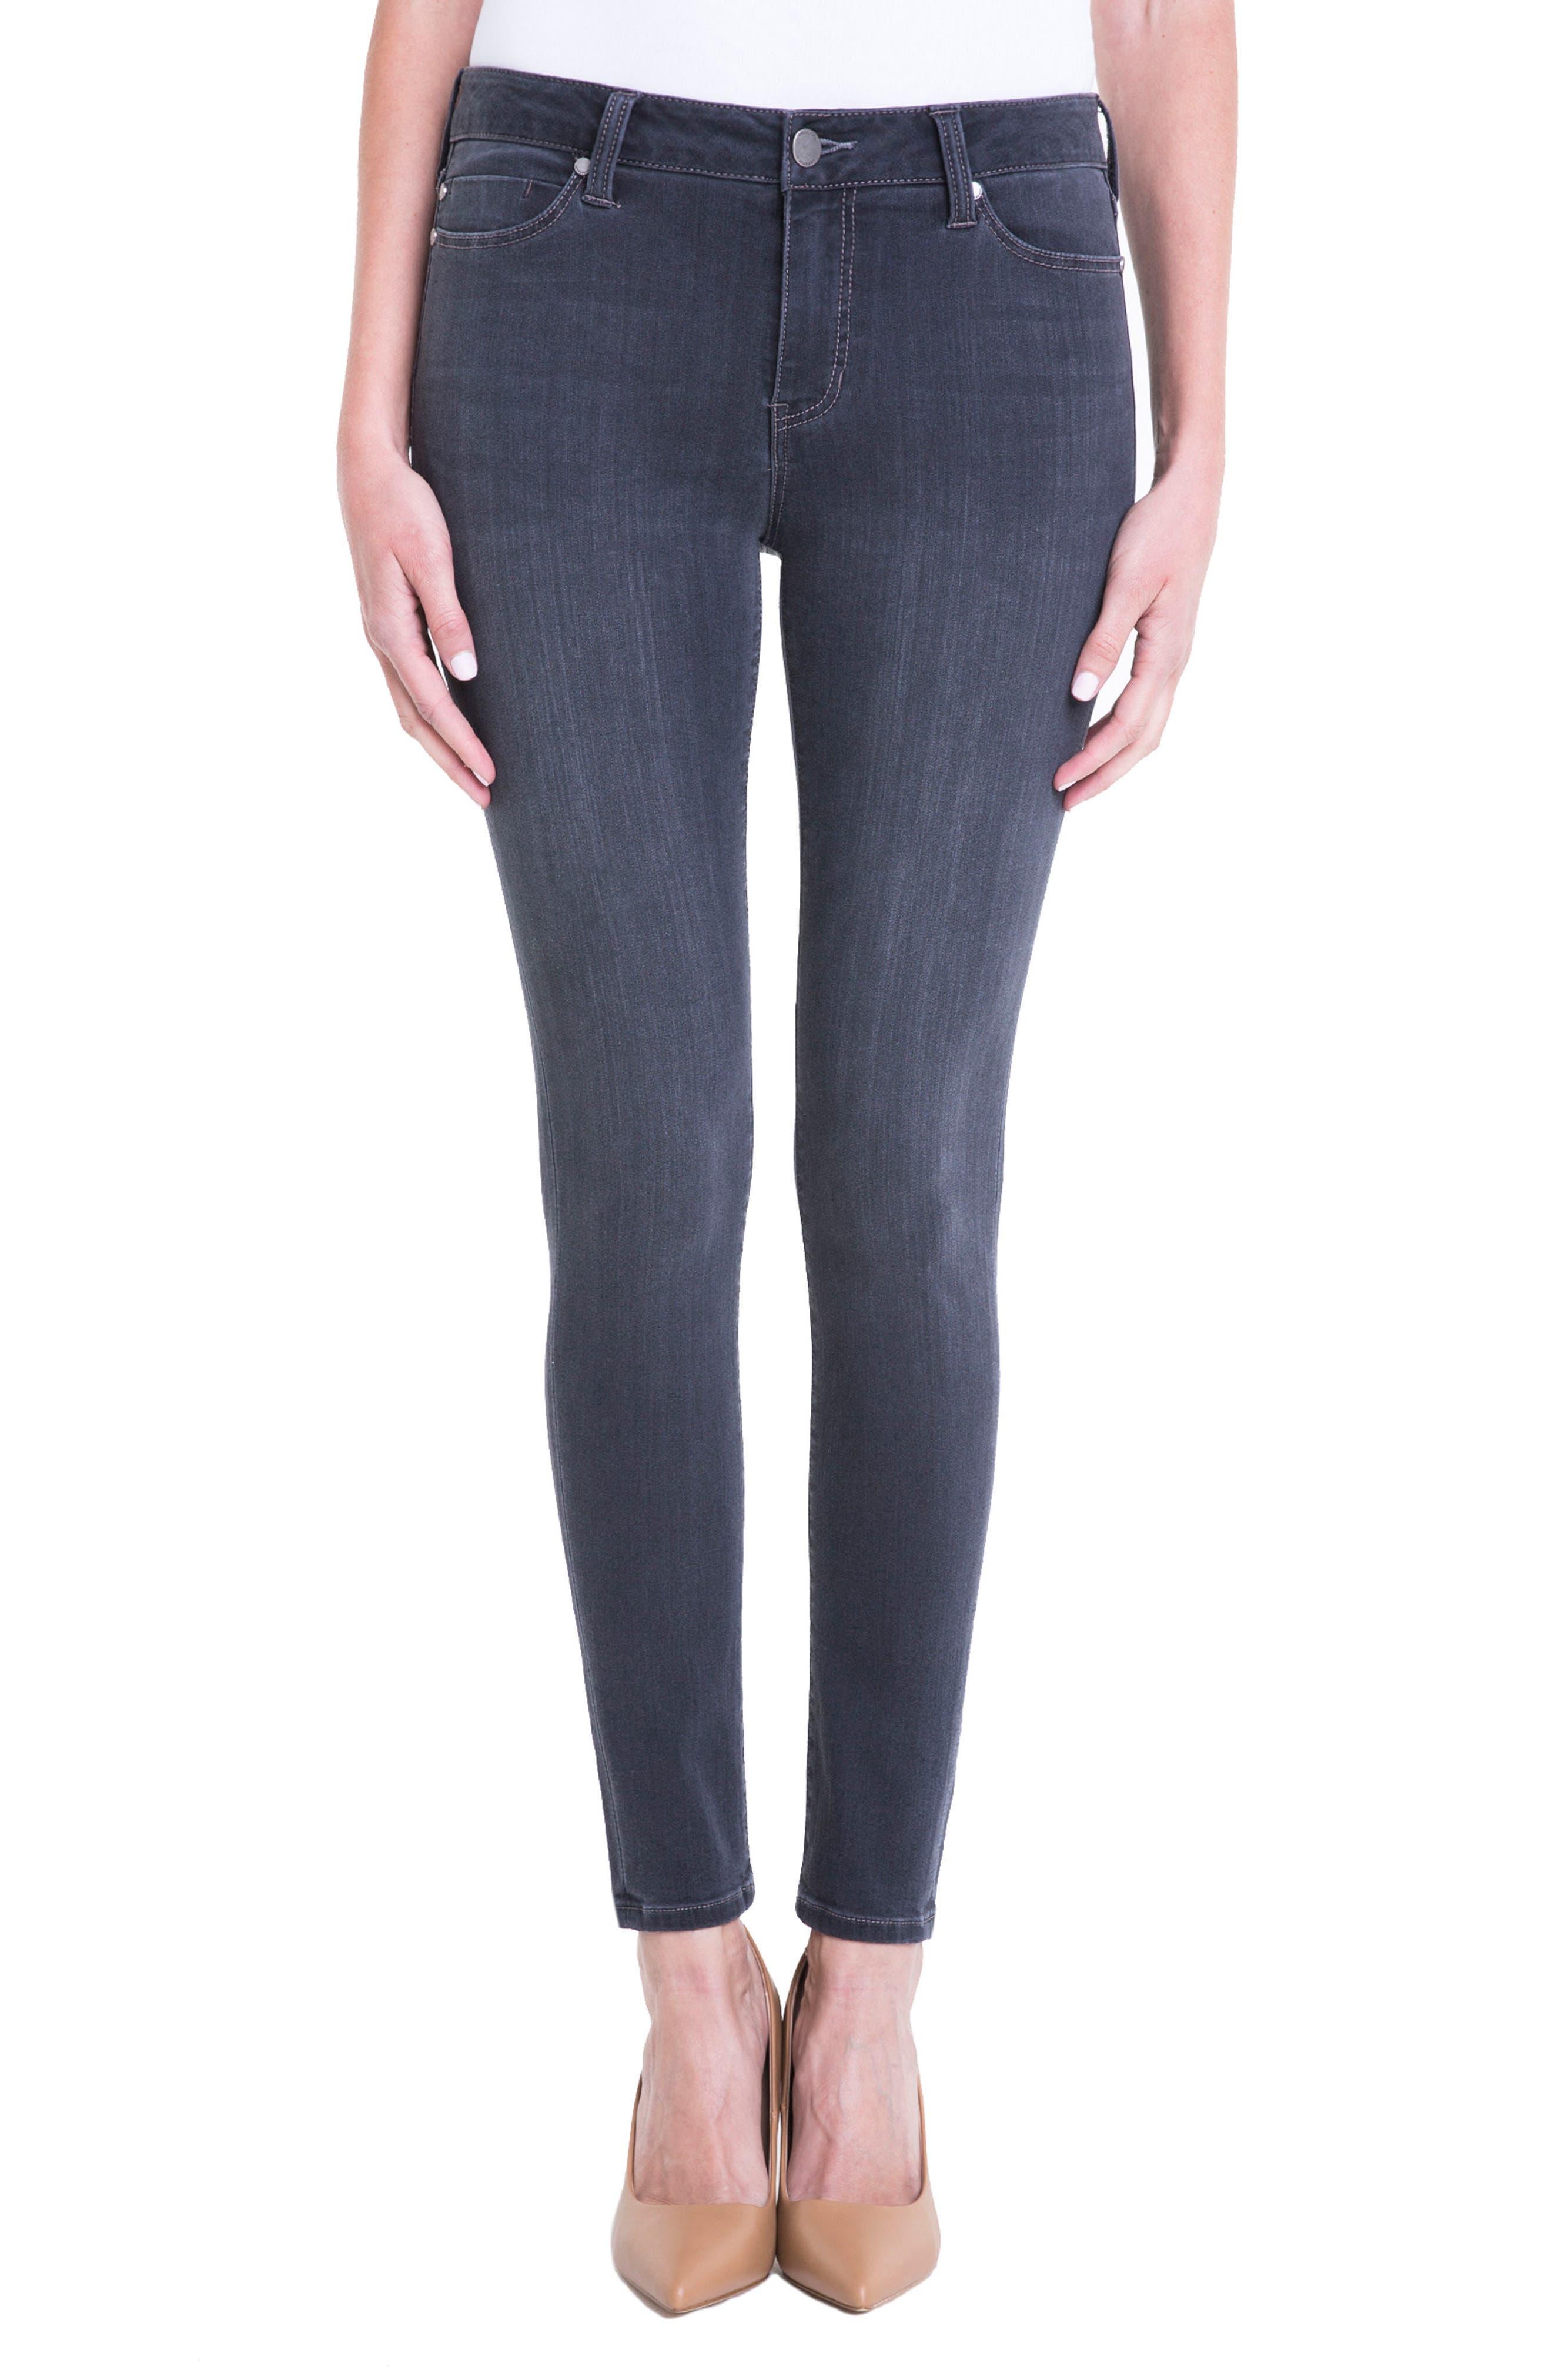 Liverpool Jeans Company Abby Stretch Skinny Jeans (Meteorite)